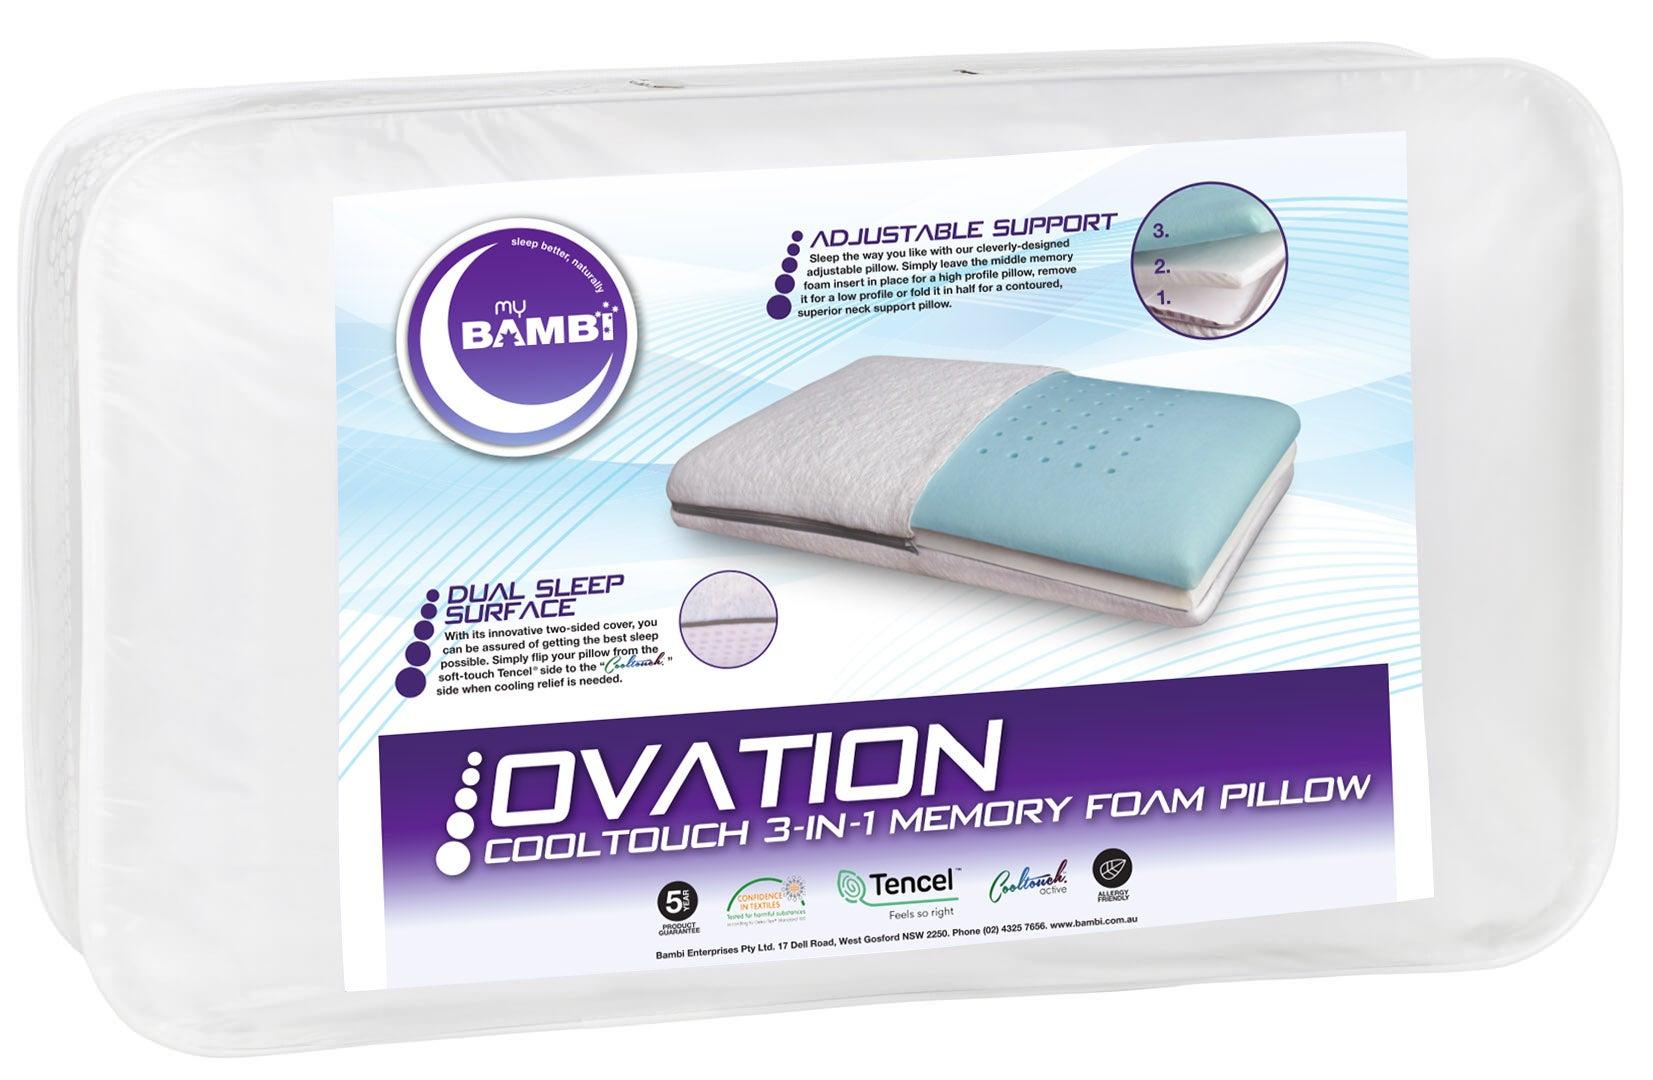 Ovation memory foam 3-in-1 Adjustable Pillow